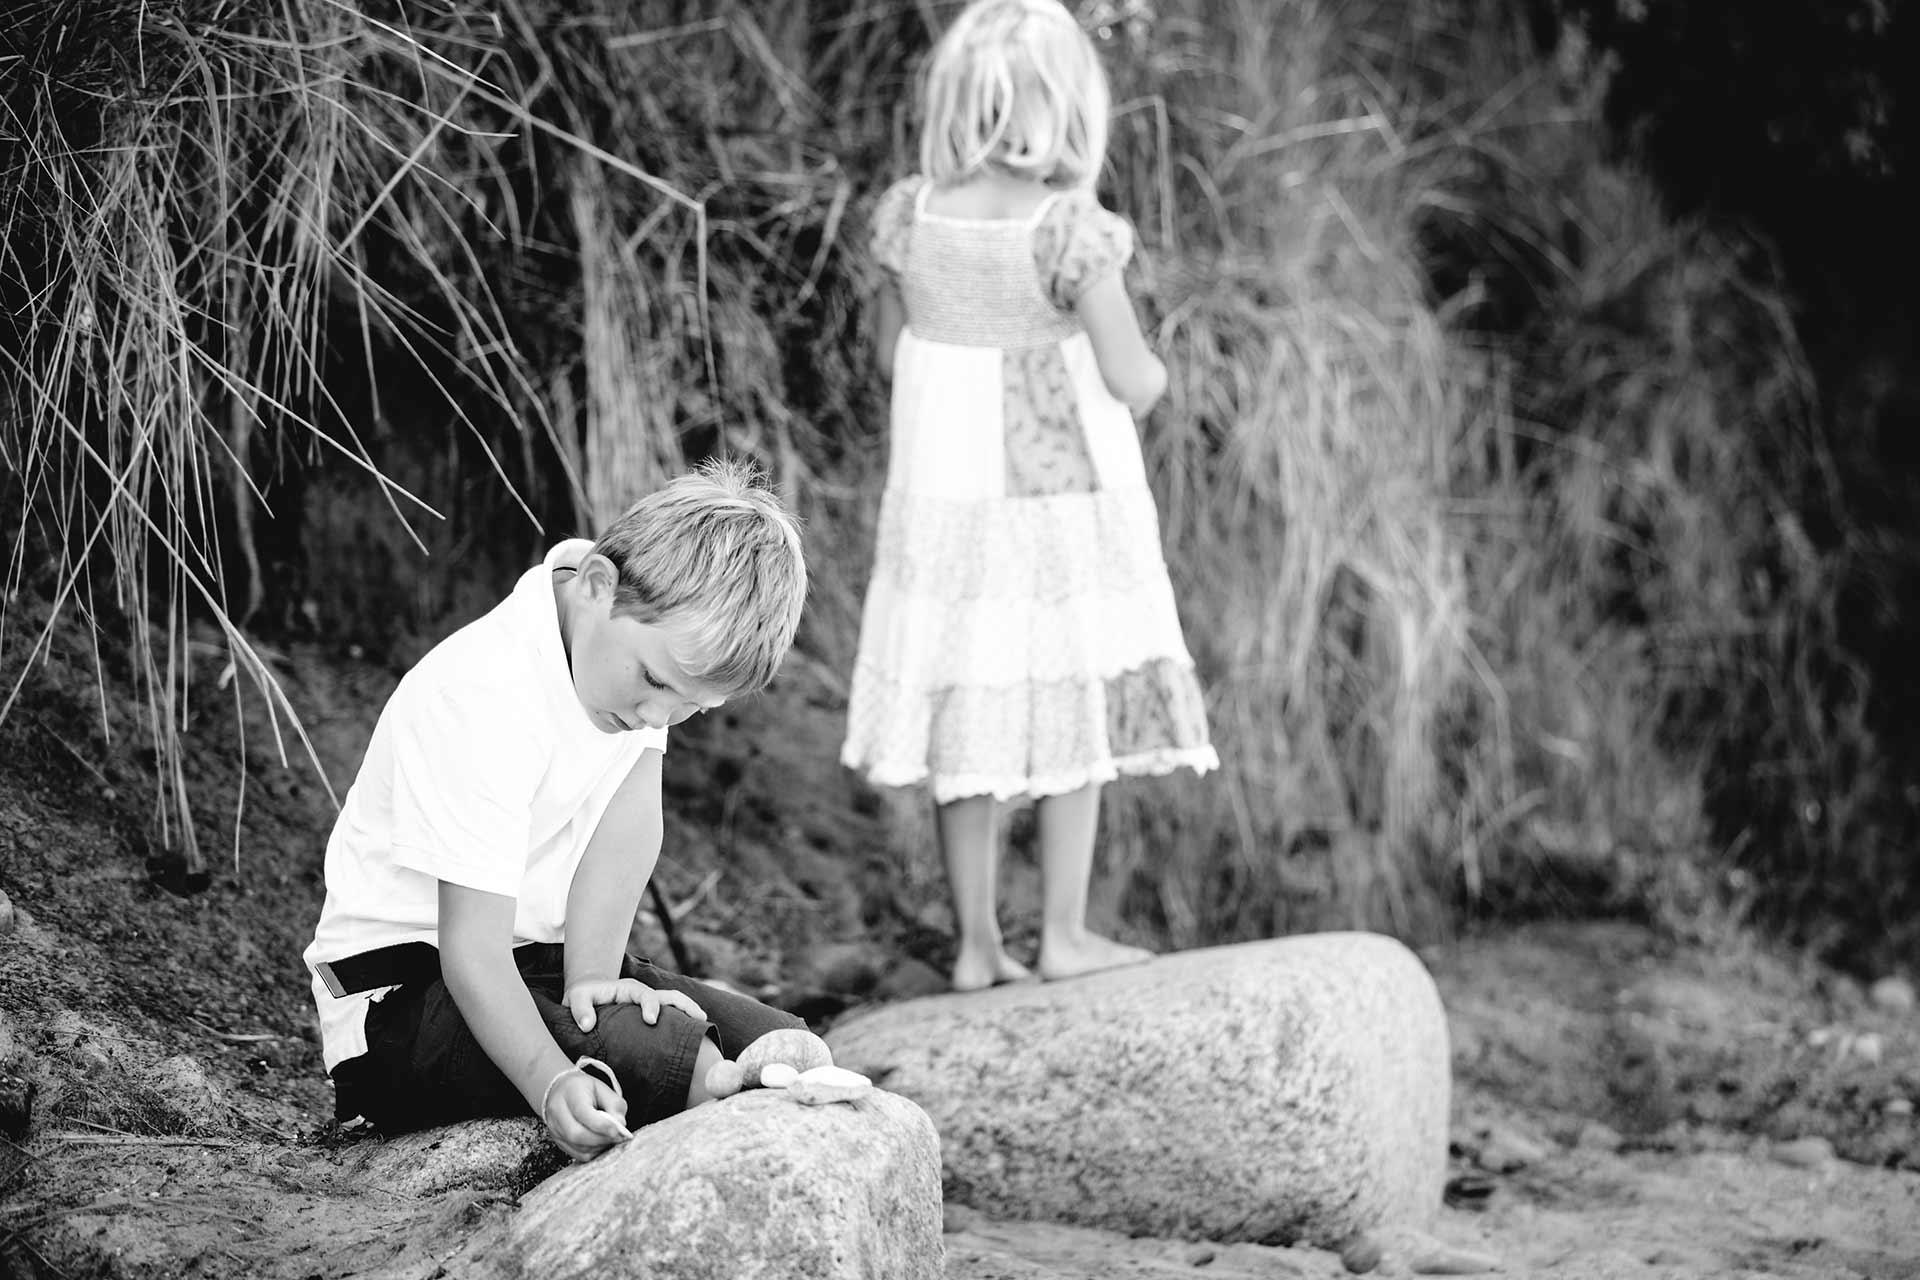 Junge-sitzt-vertraeumt-auf-grossem-Stein-am-Strand-Shooting-am-Strand-Familienfotografie-Fotograf-Rostock - Familienshooting